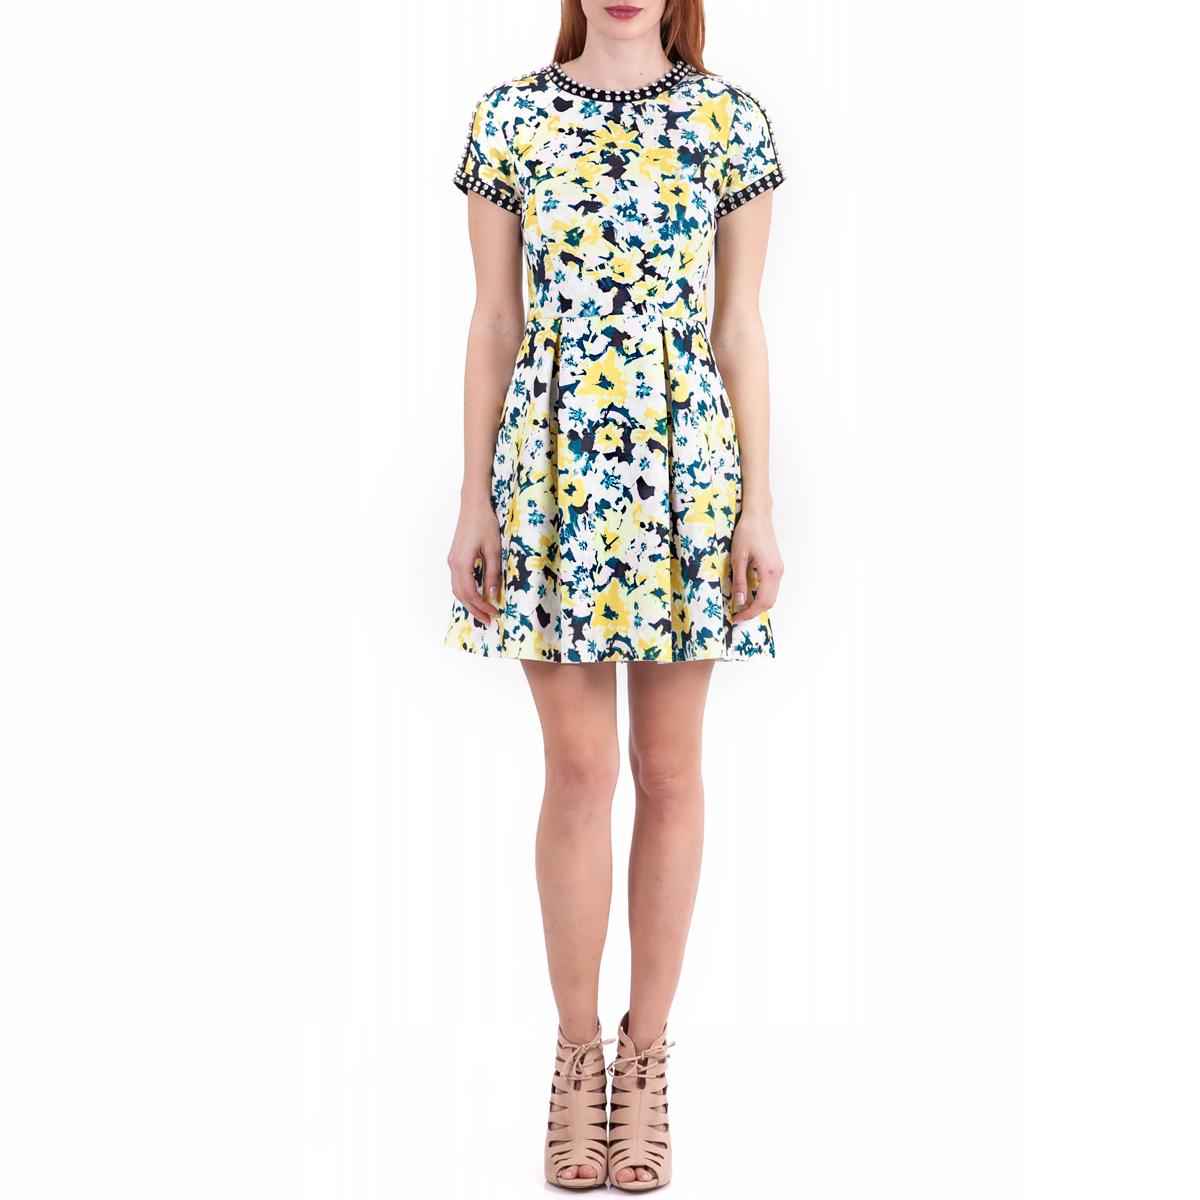 JUICY COUTURE - Γυναικείο φόρεμα Juicy Couture μαύρο-κίτρινο γυναικεία ρούχα φορέματα μίνι